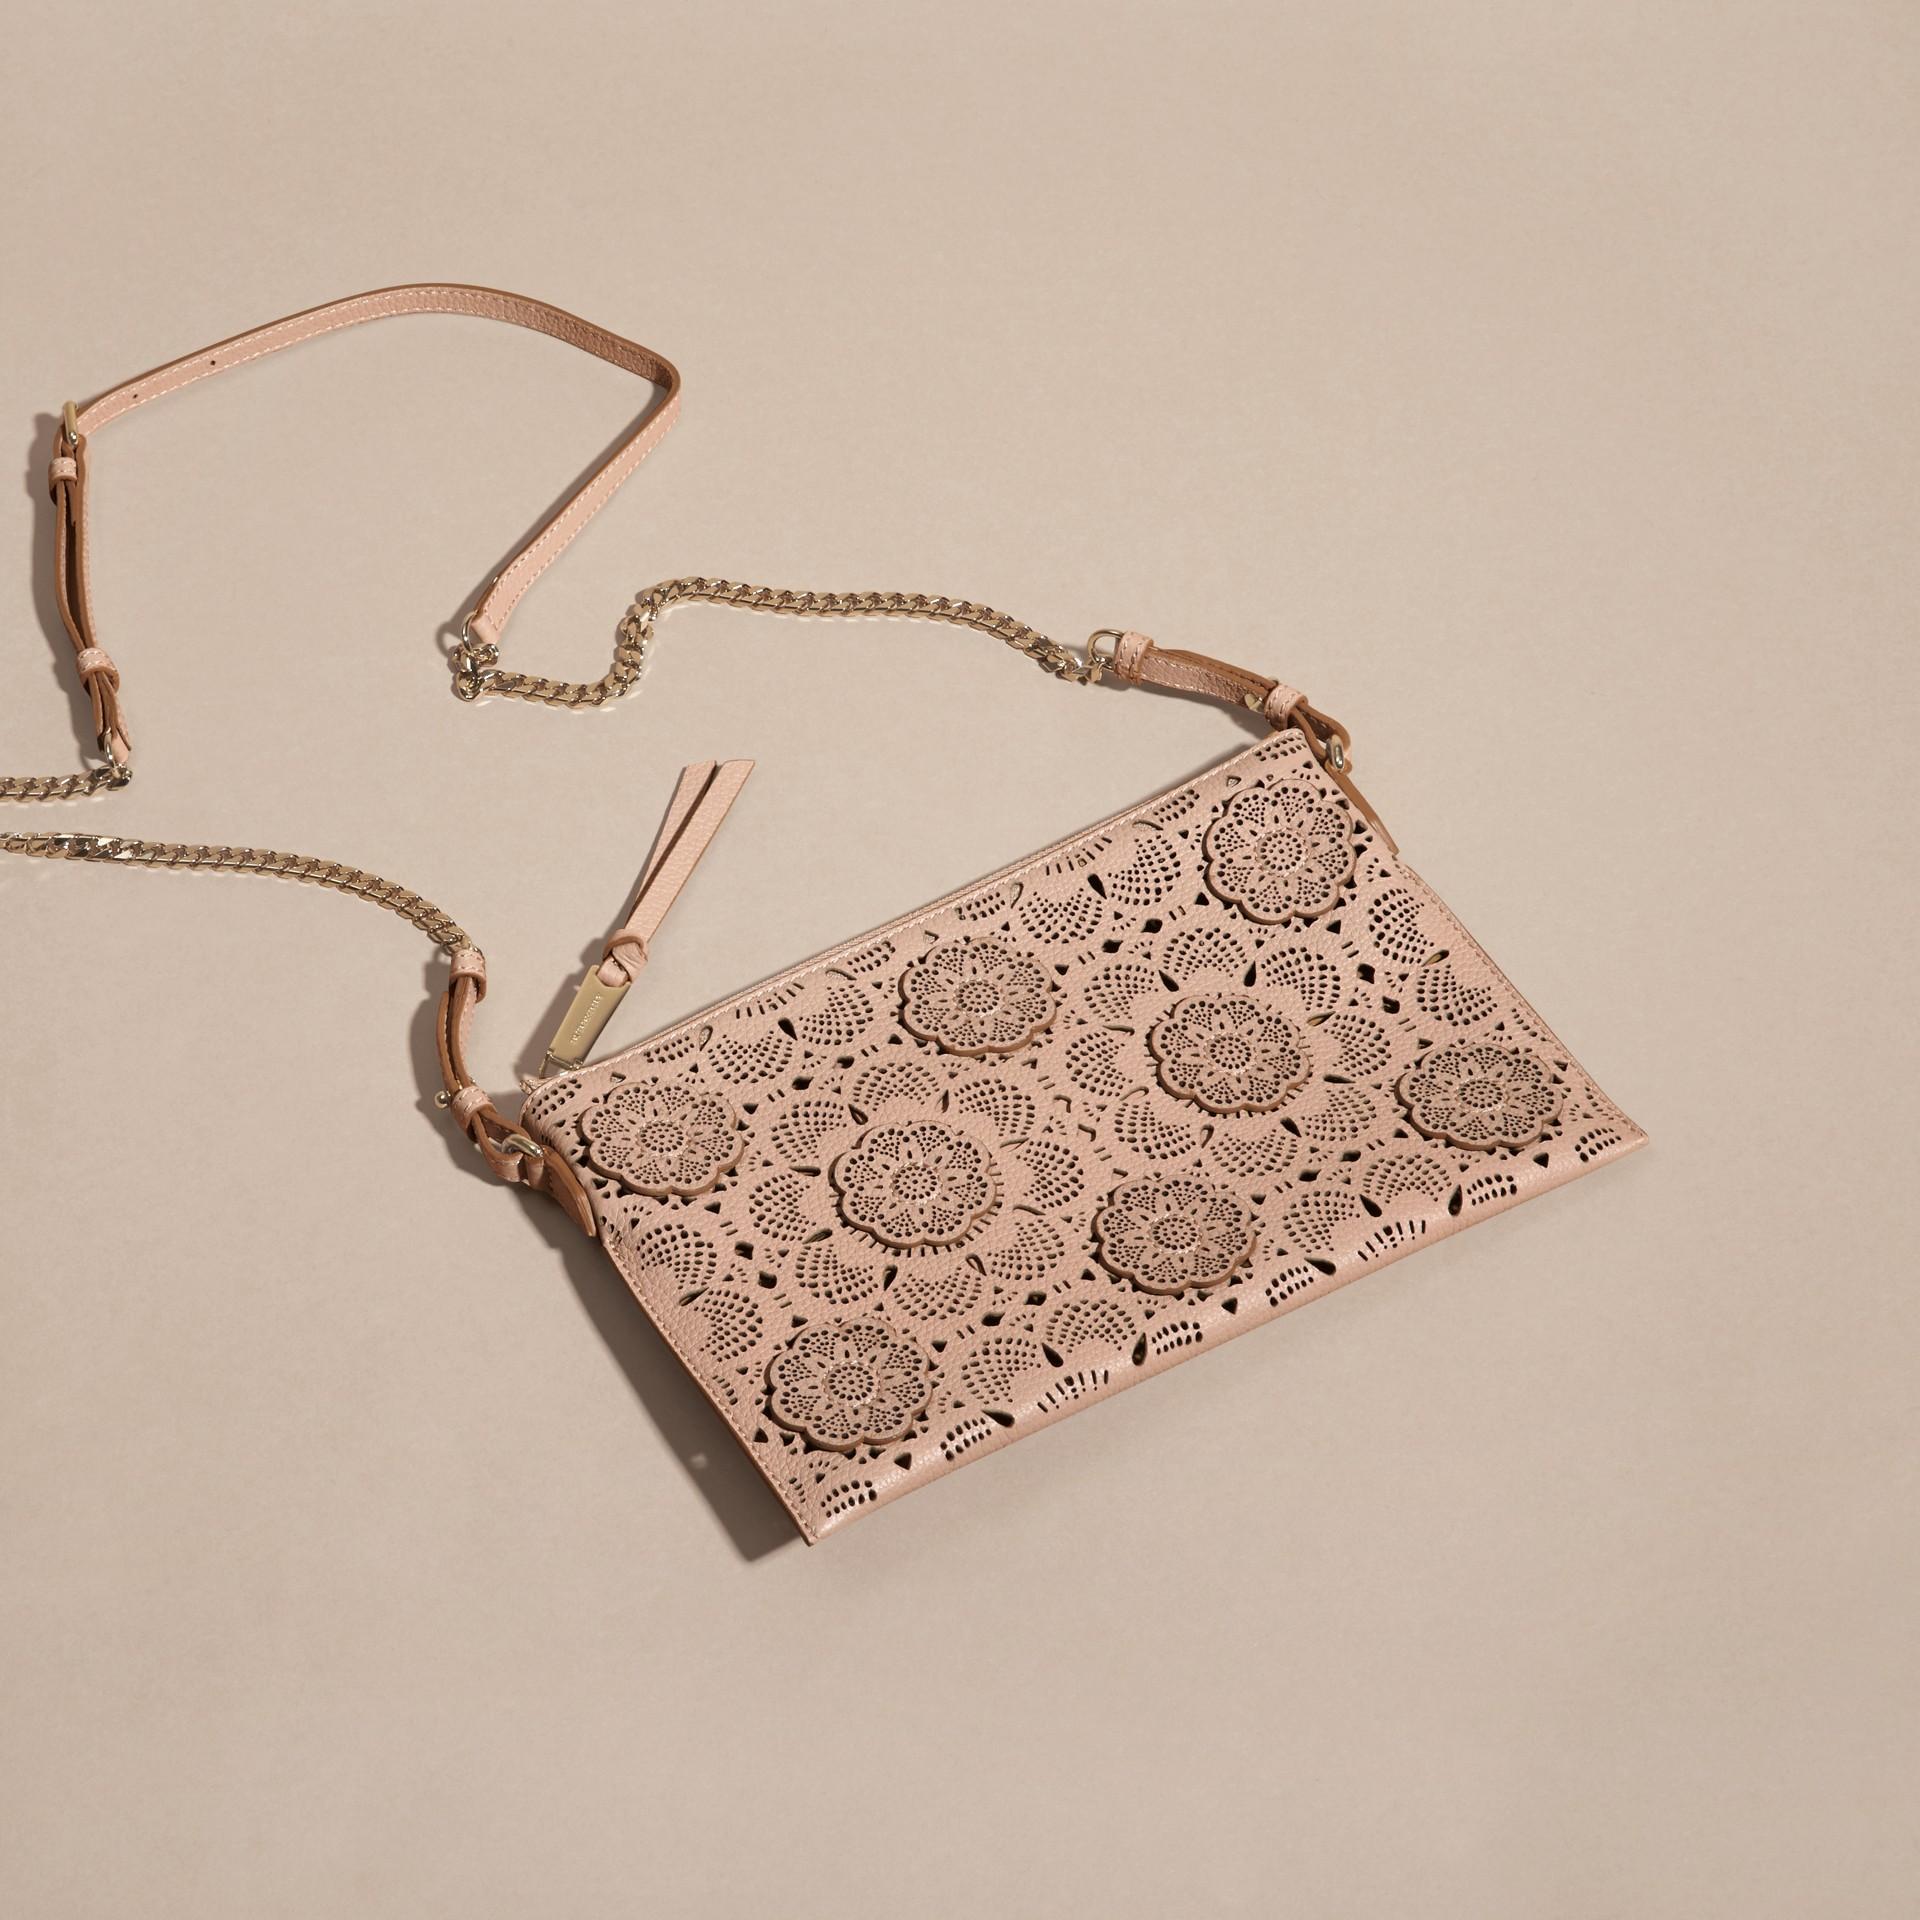 Pale apricot Laser-cut Floral Lace Leather Clutch Bag Pale Apricot - gallery image 7